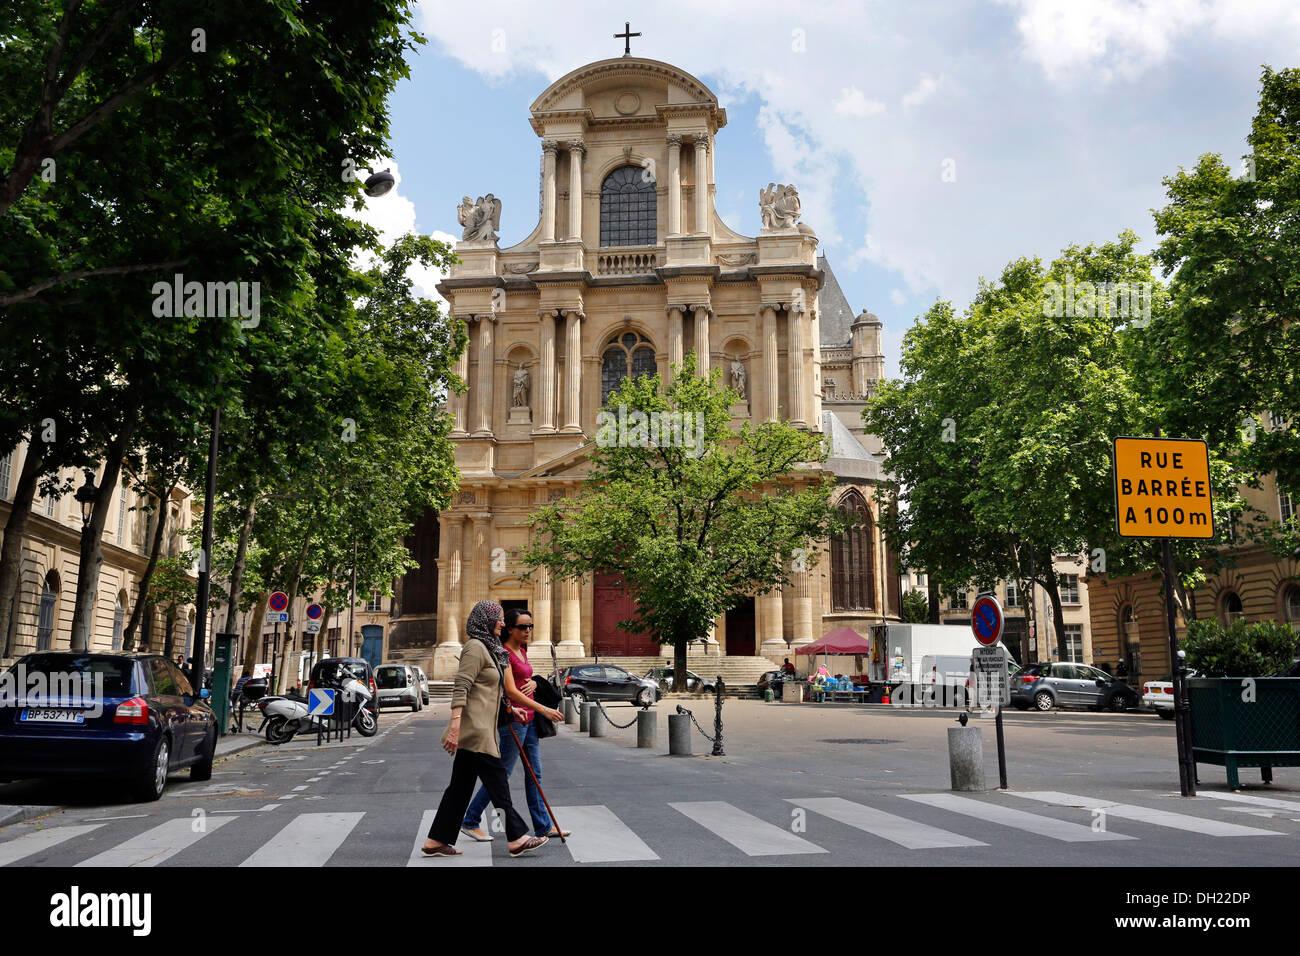 Catholic church Eglise Saint Gervais, City of Paris, France Stock Photo